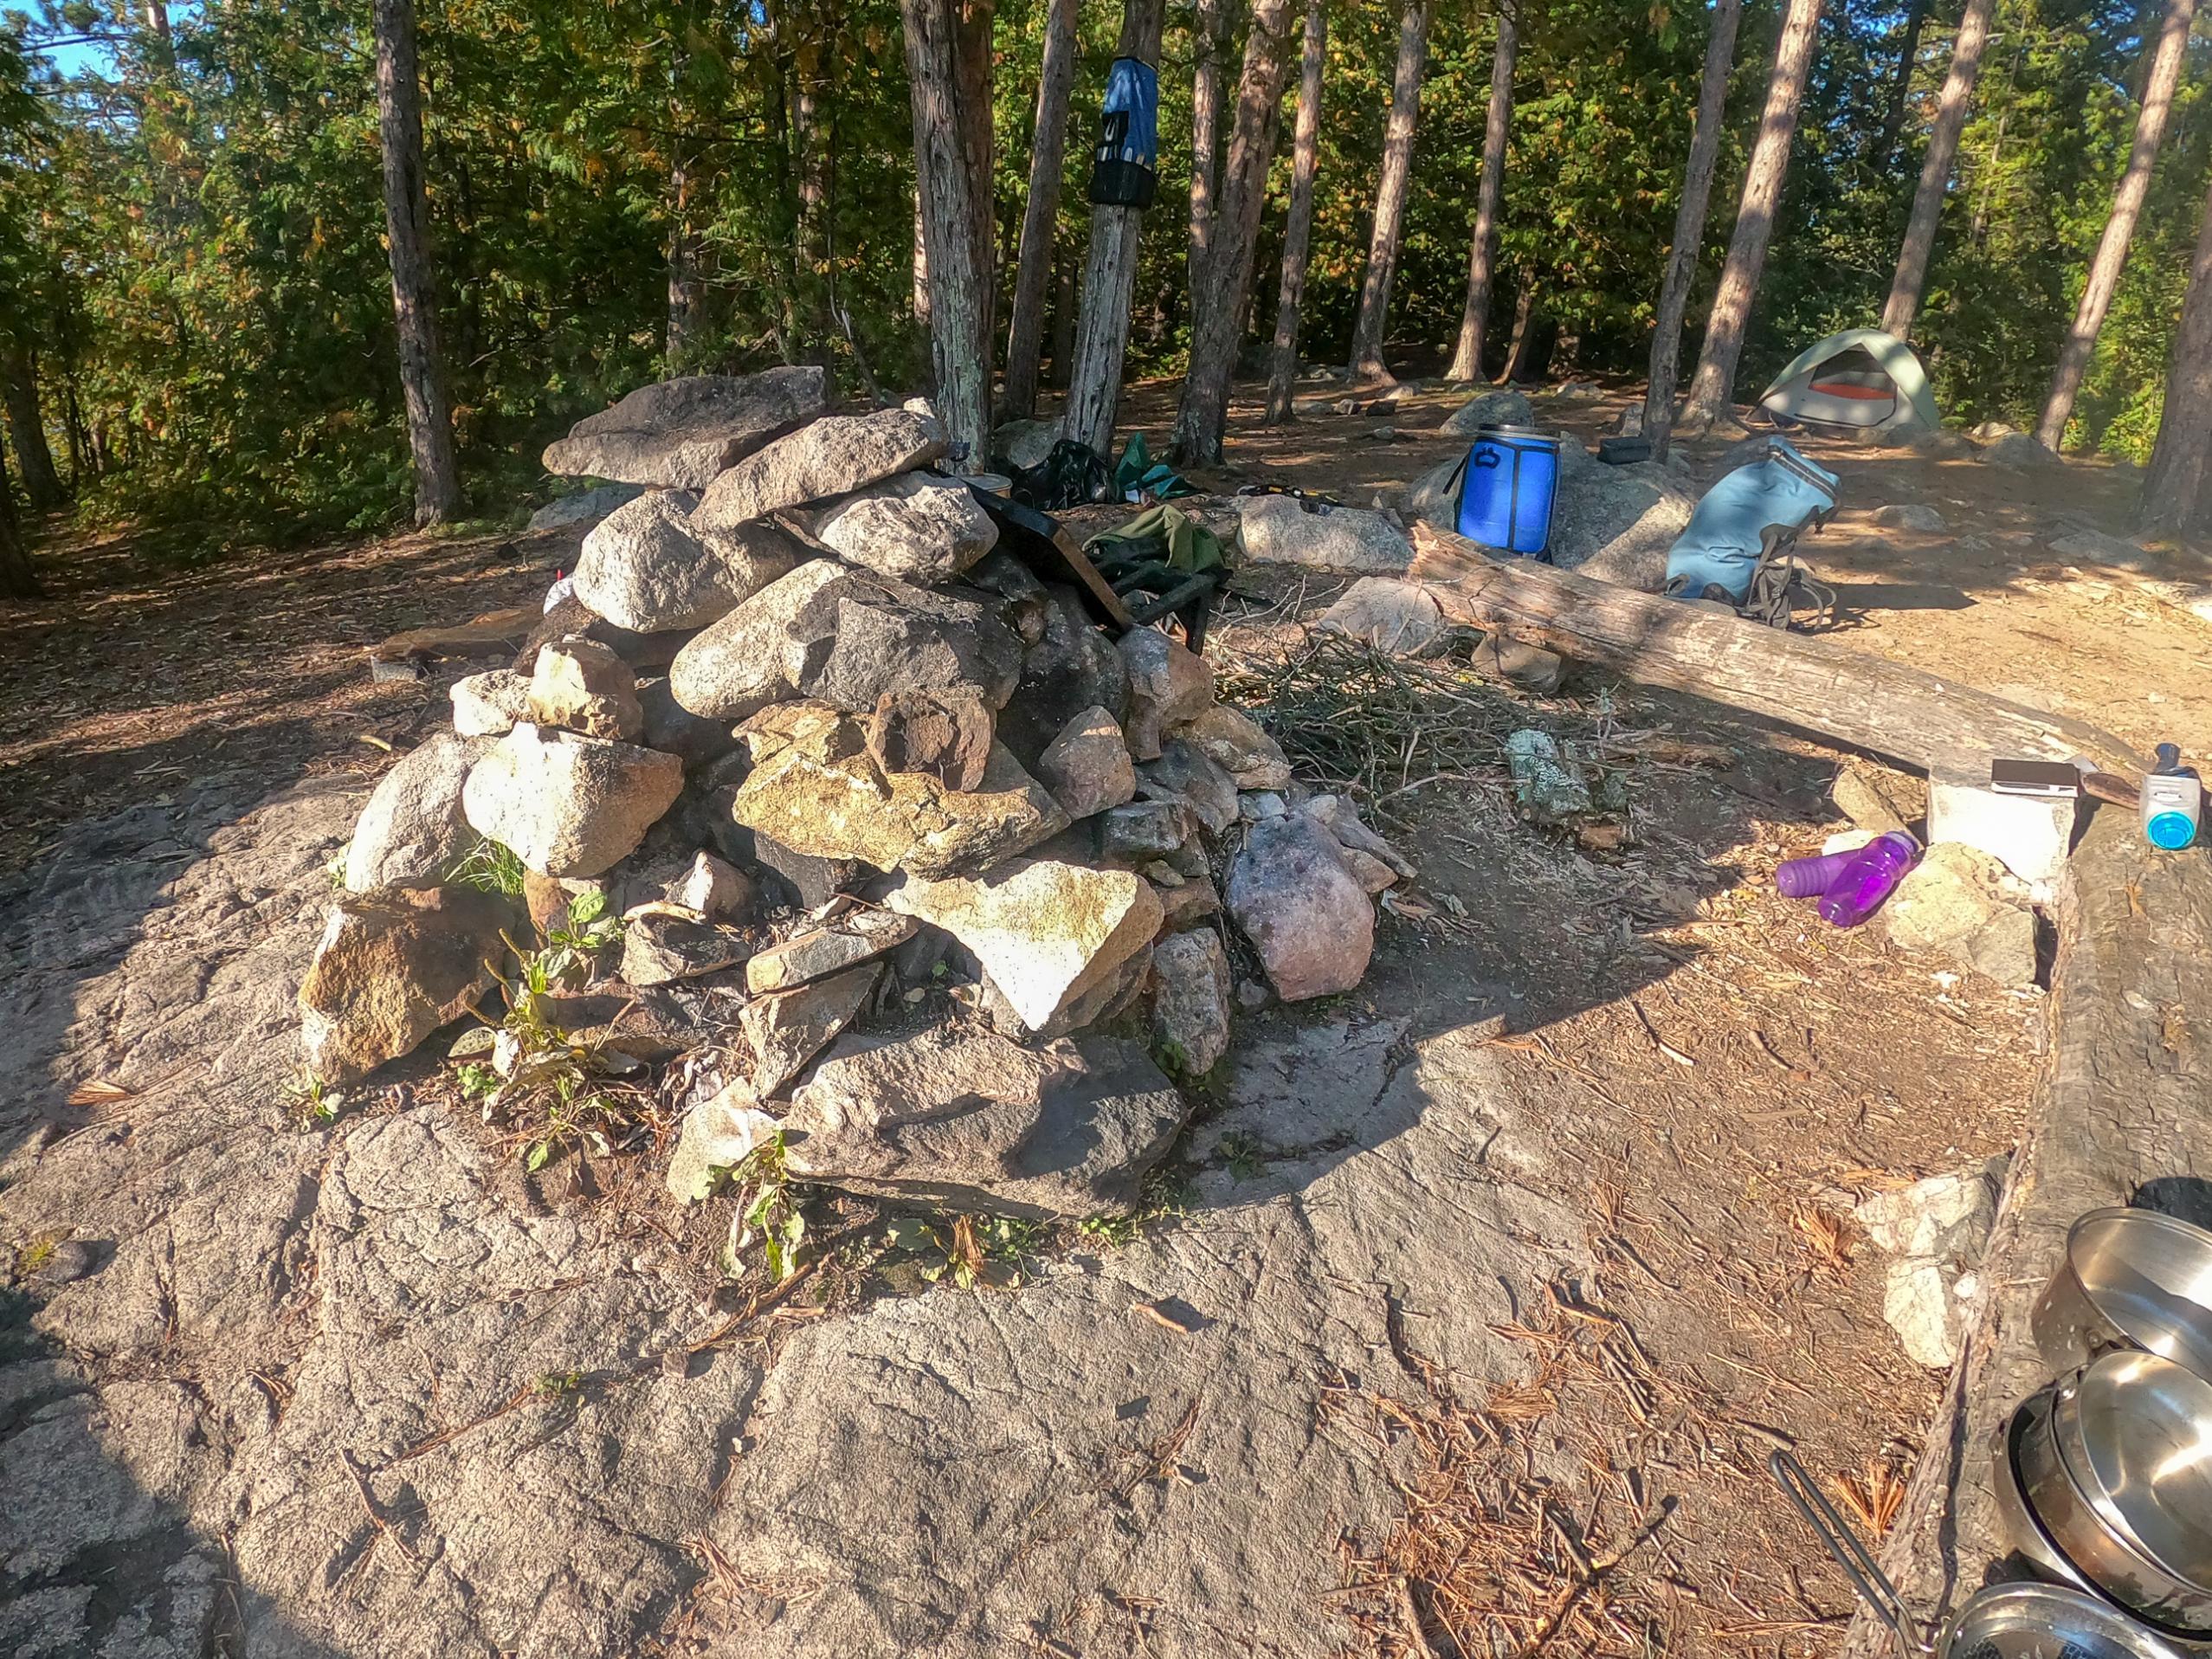 Rocks built up around fire grate